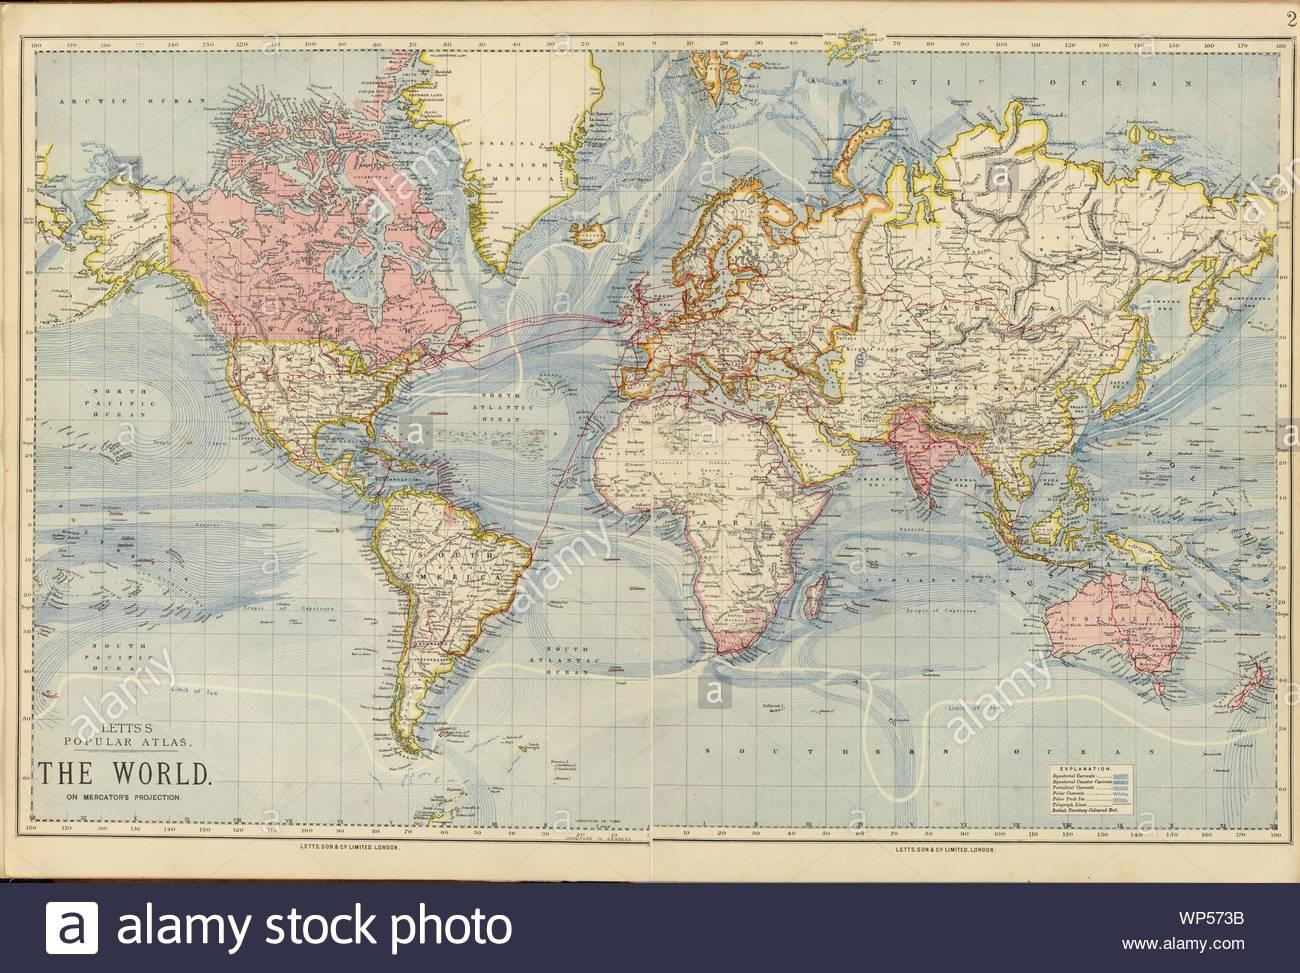 https www alamy com digital old world map printable download vintage world map printable map large world map high resolution world map poster image271793295 html